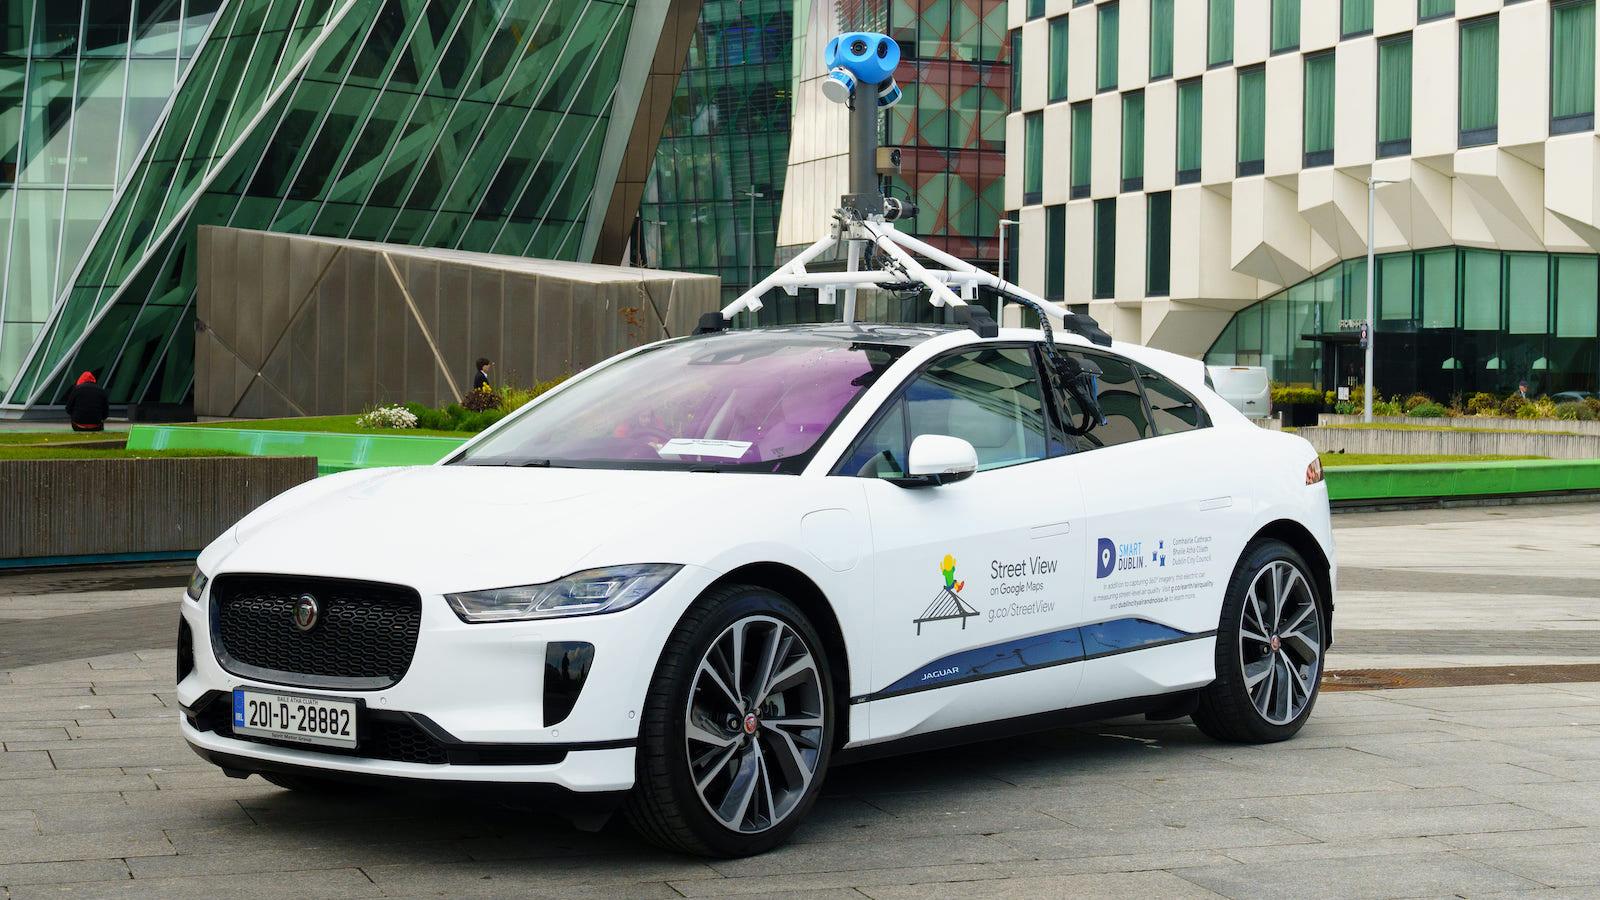 Jaguar 與 Google 合作 使用 I-PACE 監測都柏林空氣品質